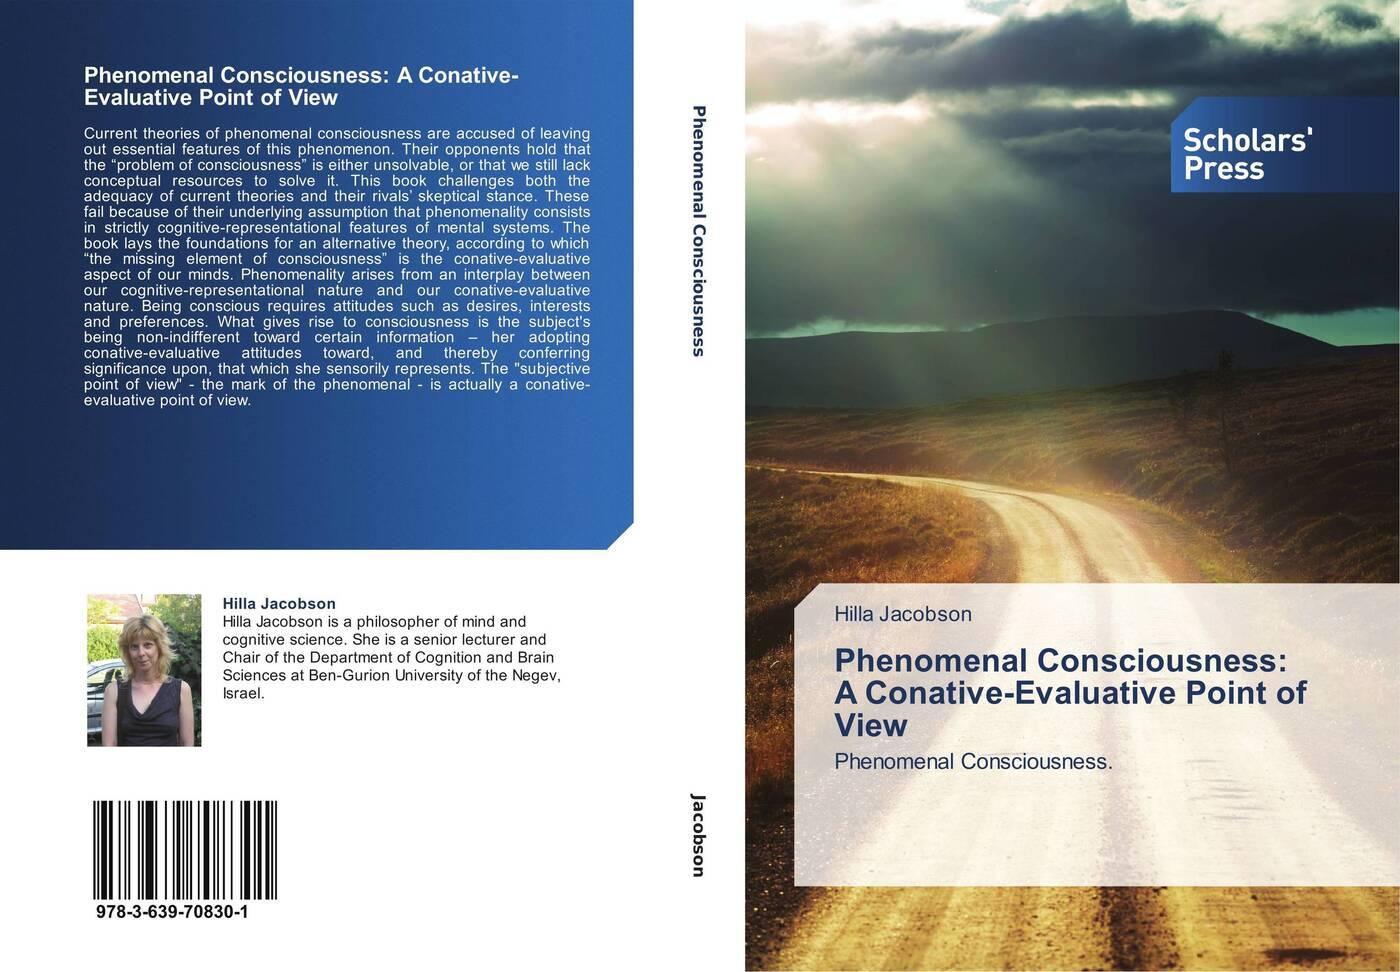 Hilla Jacobson Phenomenal Consciousness: A Conative-Evaluative Point of View hilla